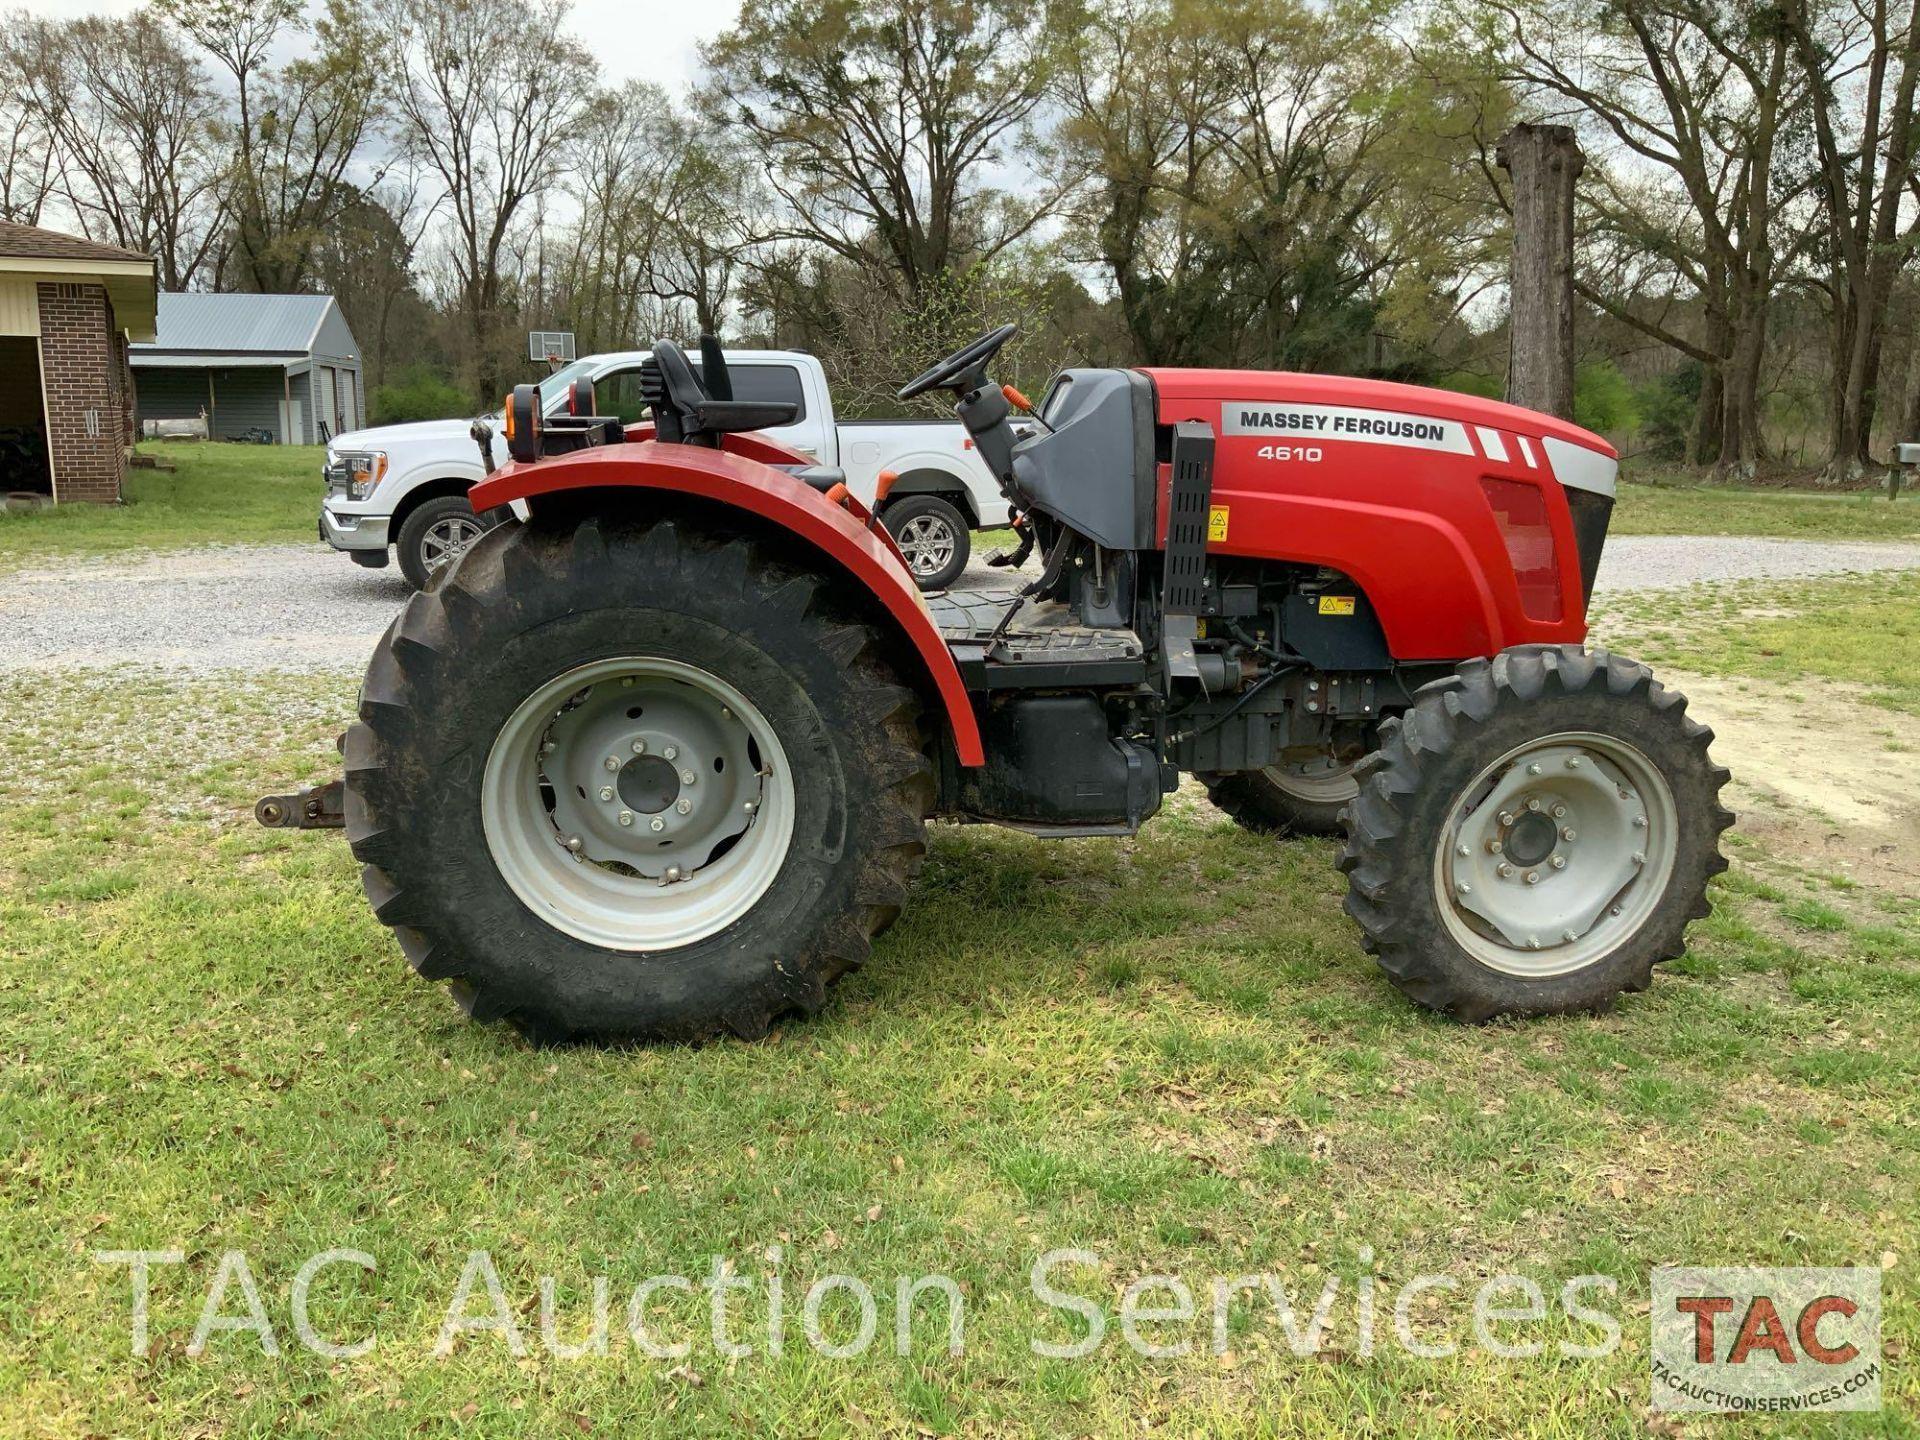 Massey-Ferguson 4610LP Farm Tractor - Image 9 of 26